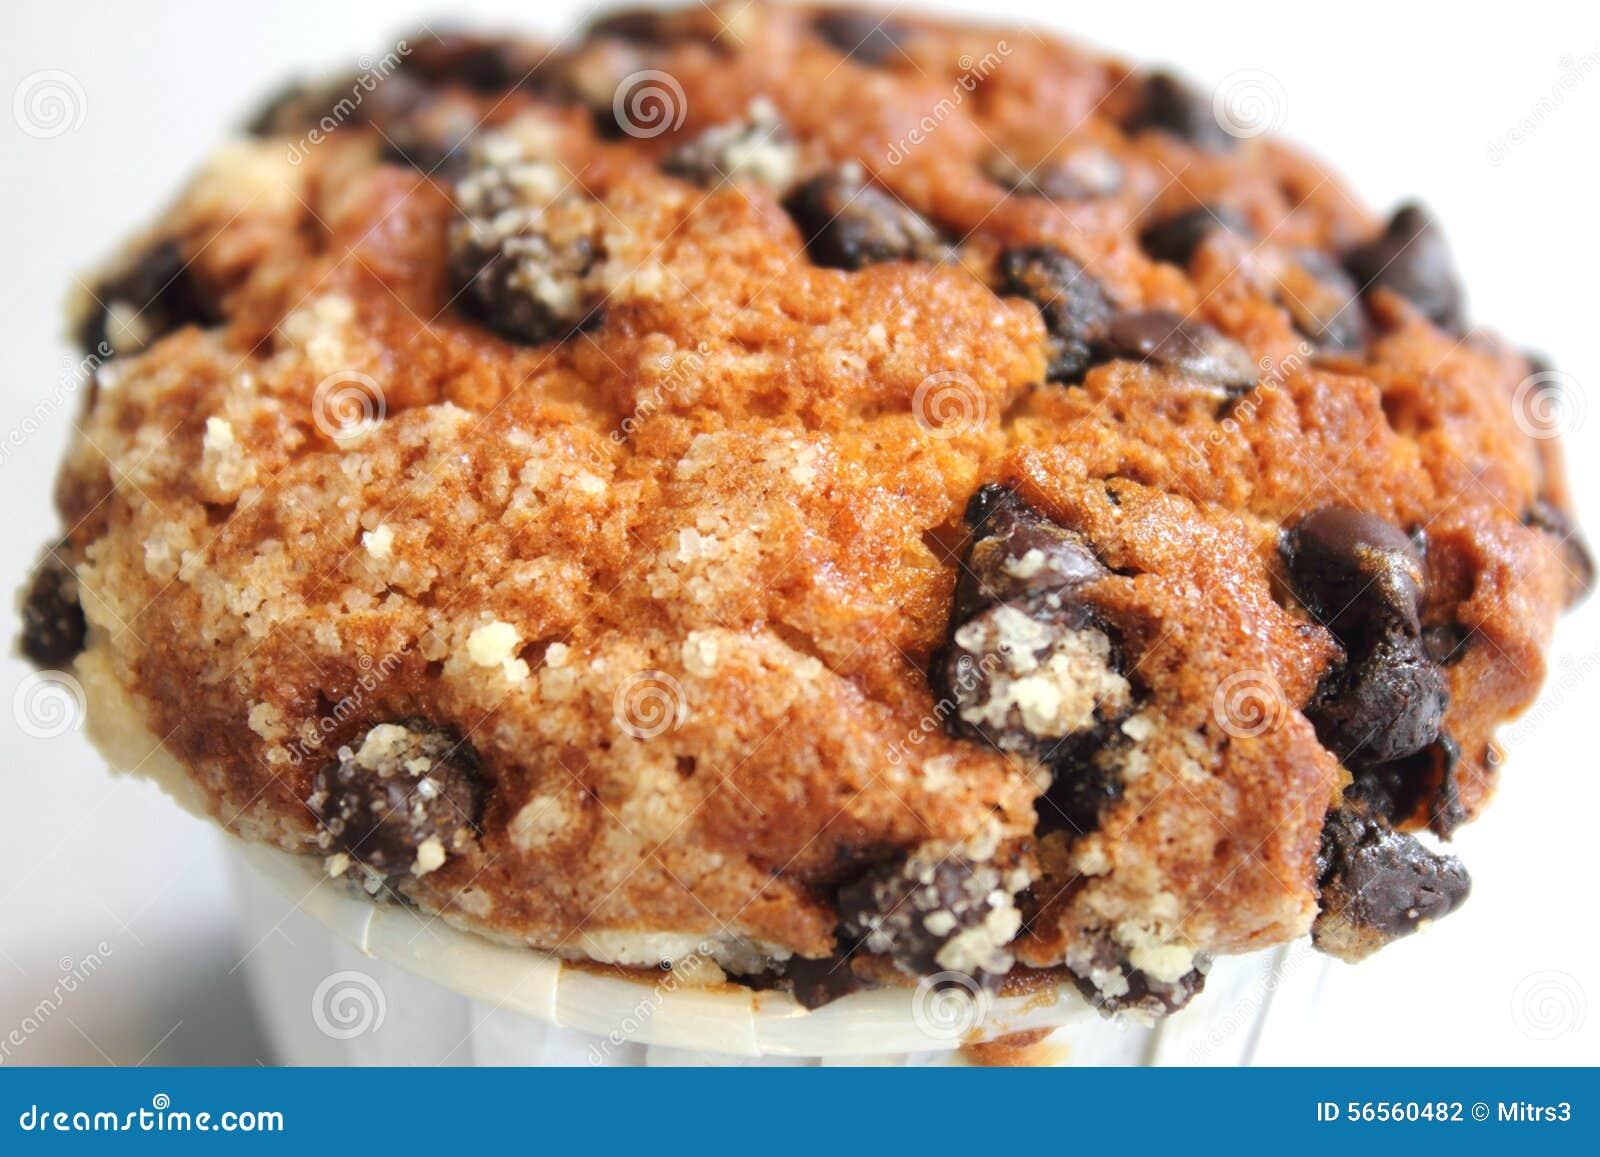 Download Muffin τσιπ σοκολάτας ανθυγειινή κινηματογράφηση σε πρώτο πλάνο τροφίμων Στοκ Εικόνες - εικόνα από ζάχαρη, ανασκόπησης: 56560482